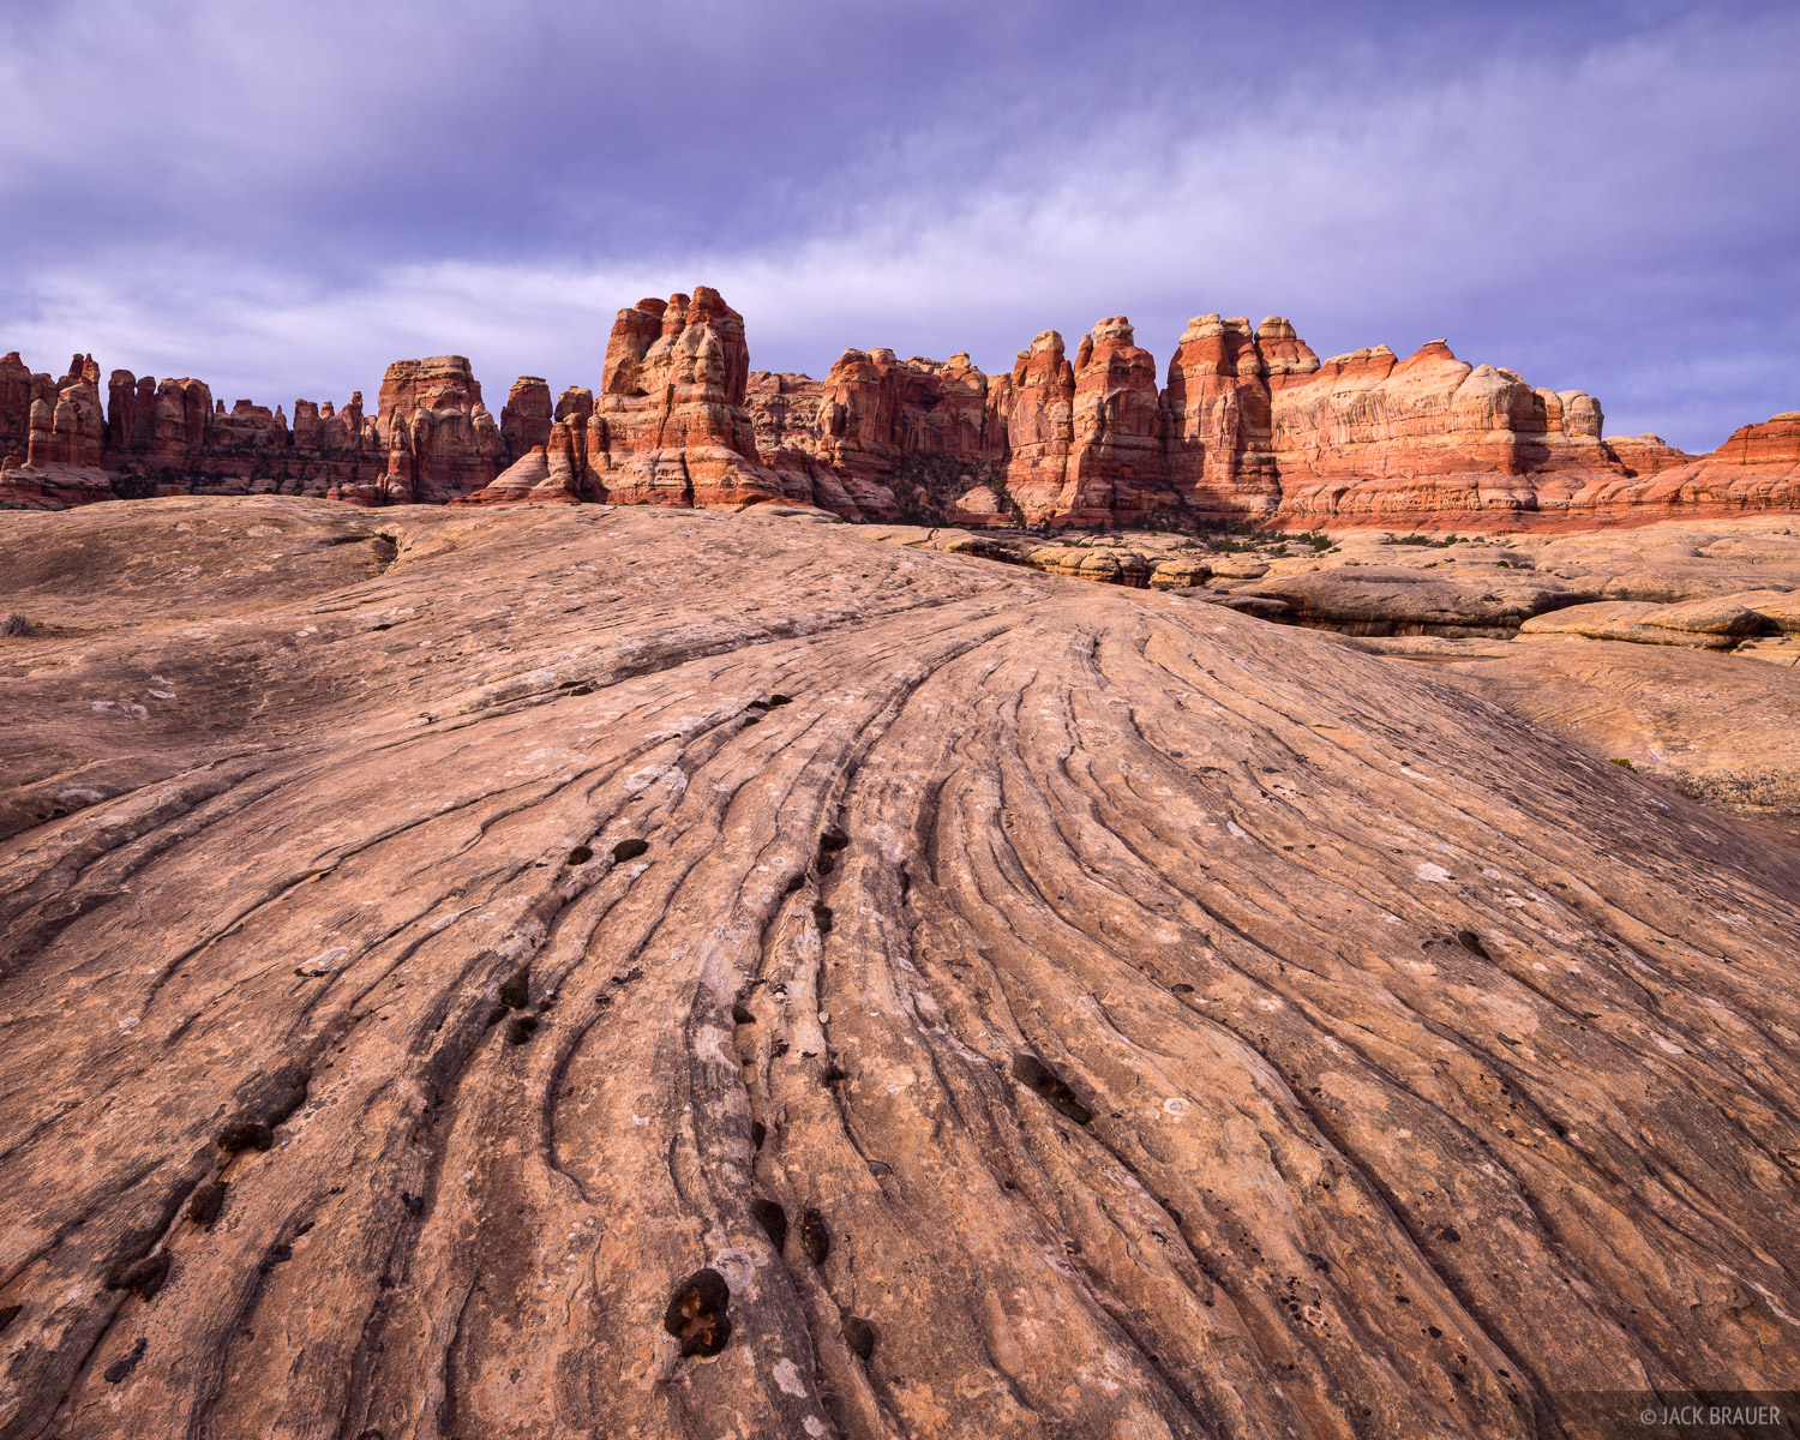 Canyonlands National Park, Needles District, Utah, Elephant Canyon, photo